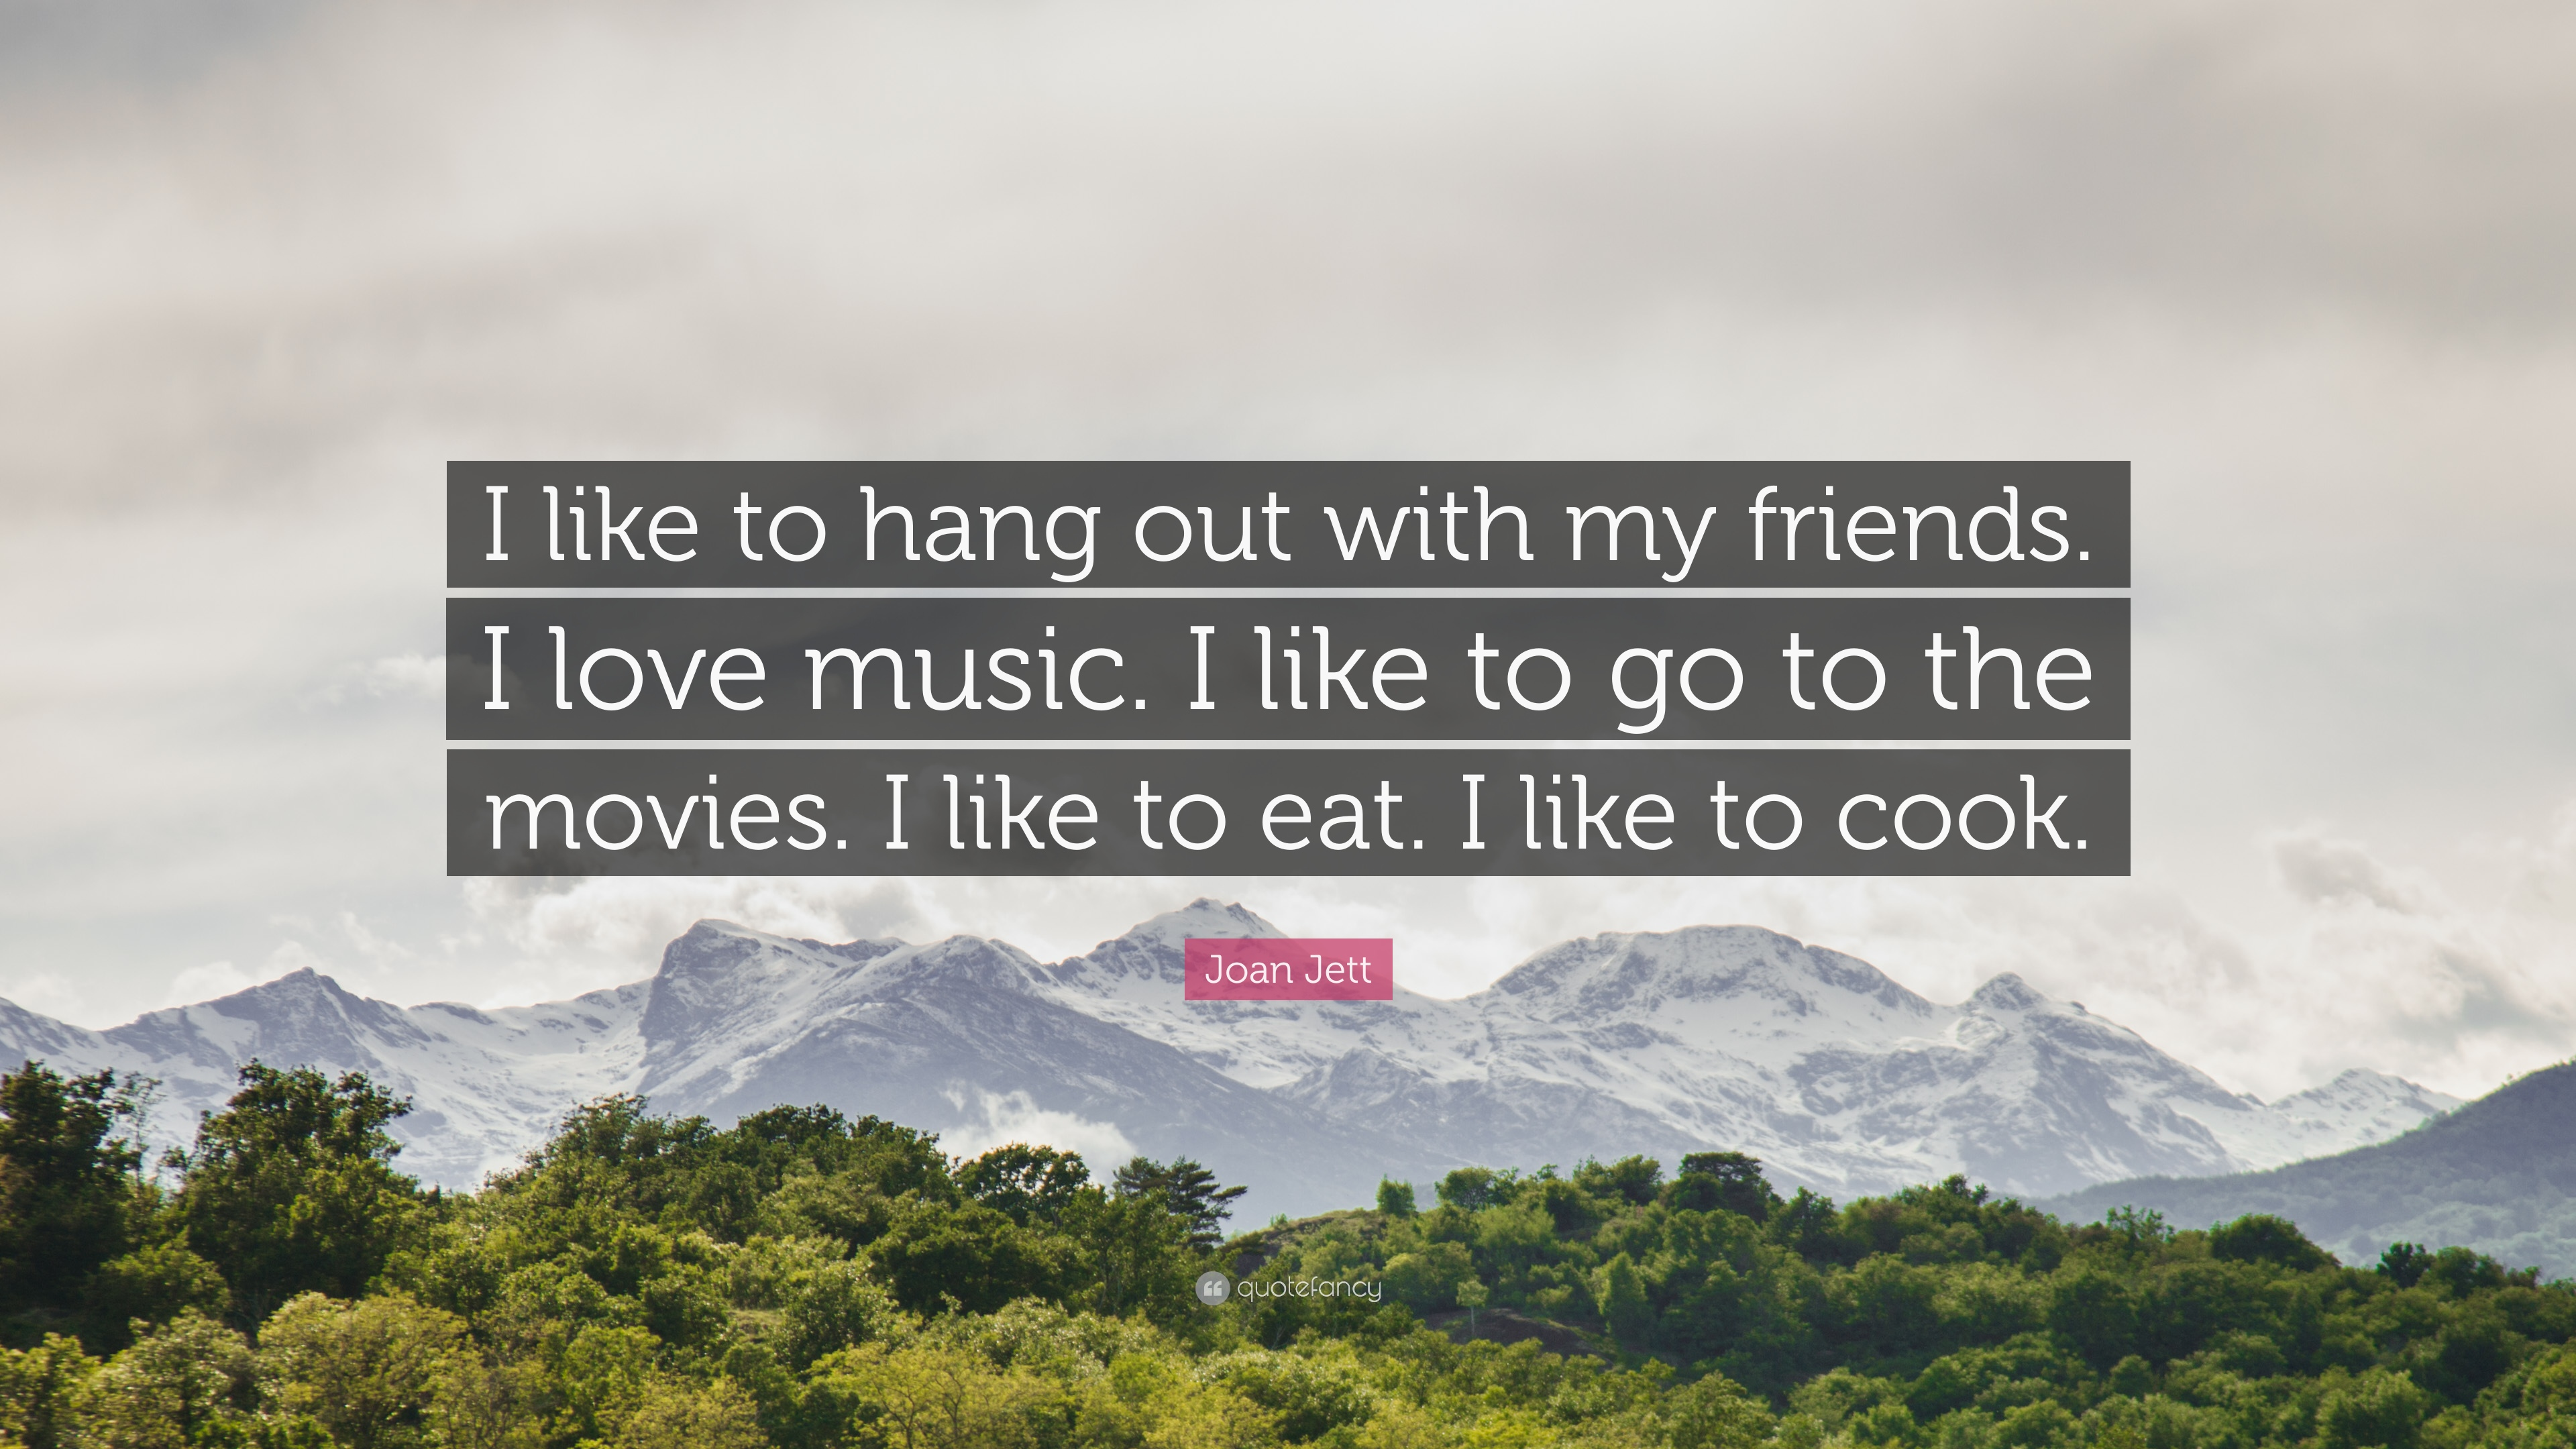 Joan Jett Quote u201cI like to hang